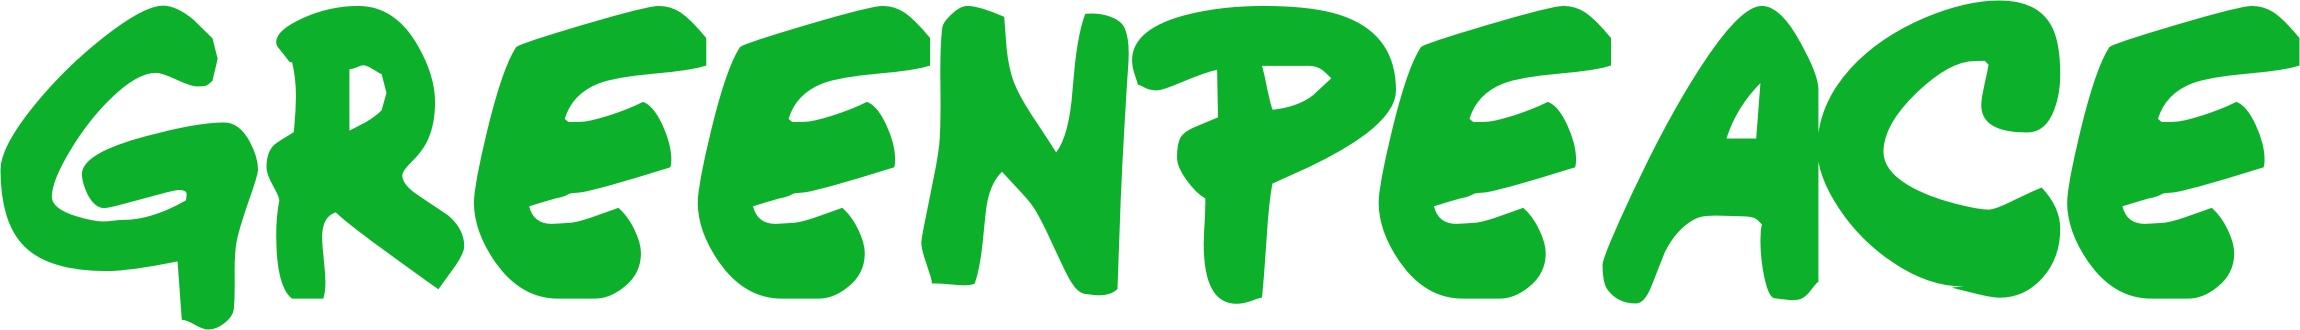 greenpeace_logo.jpg